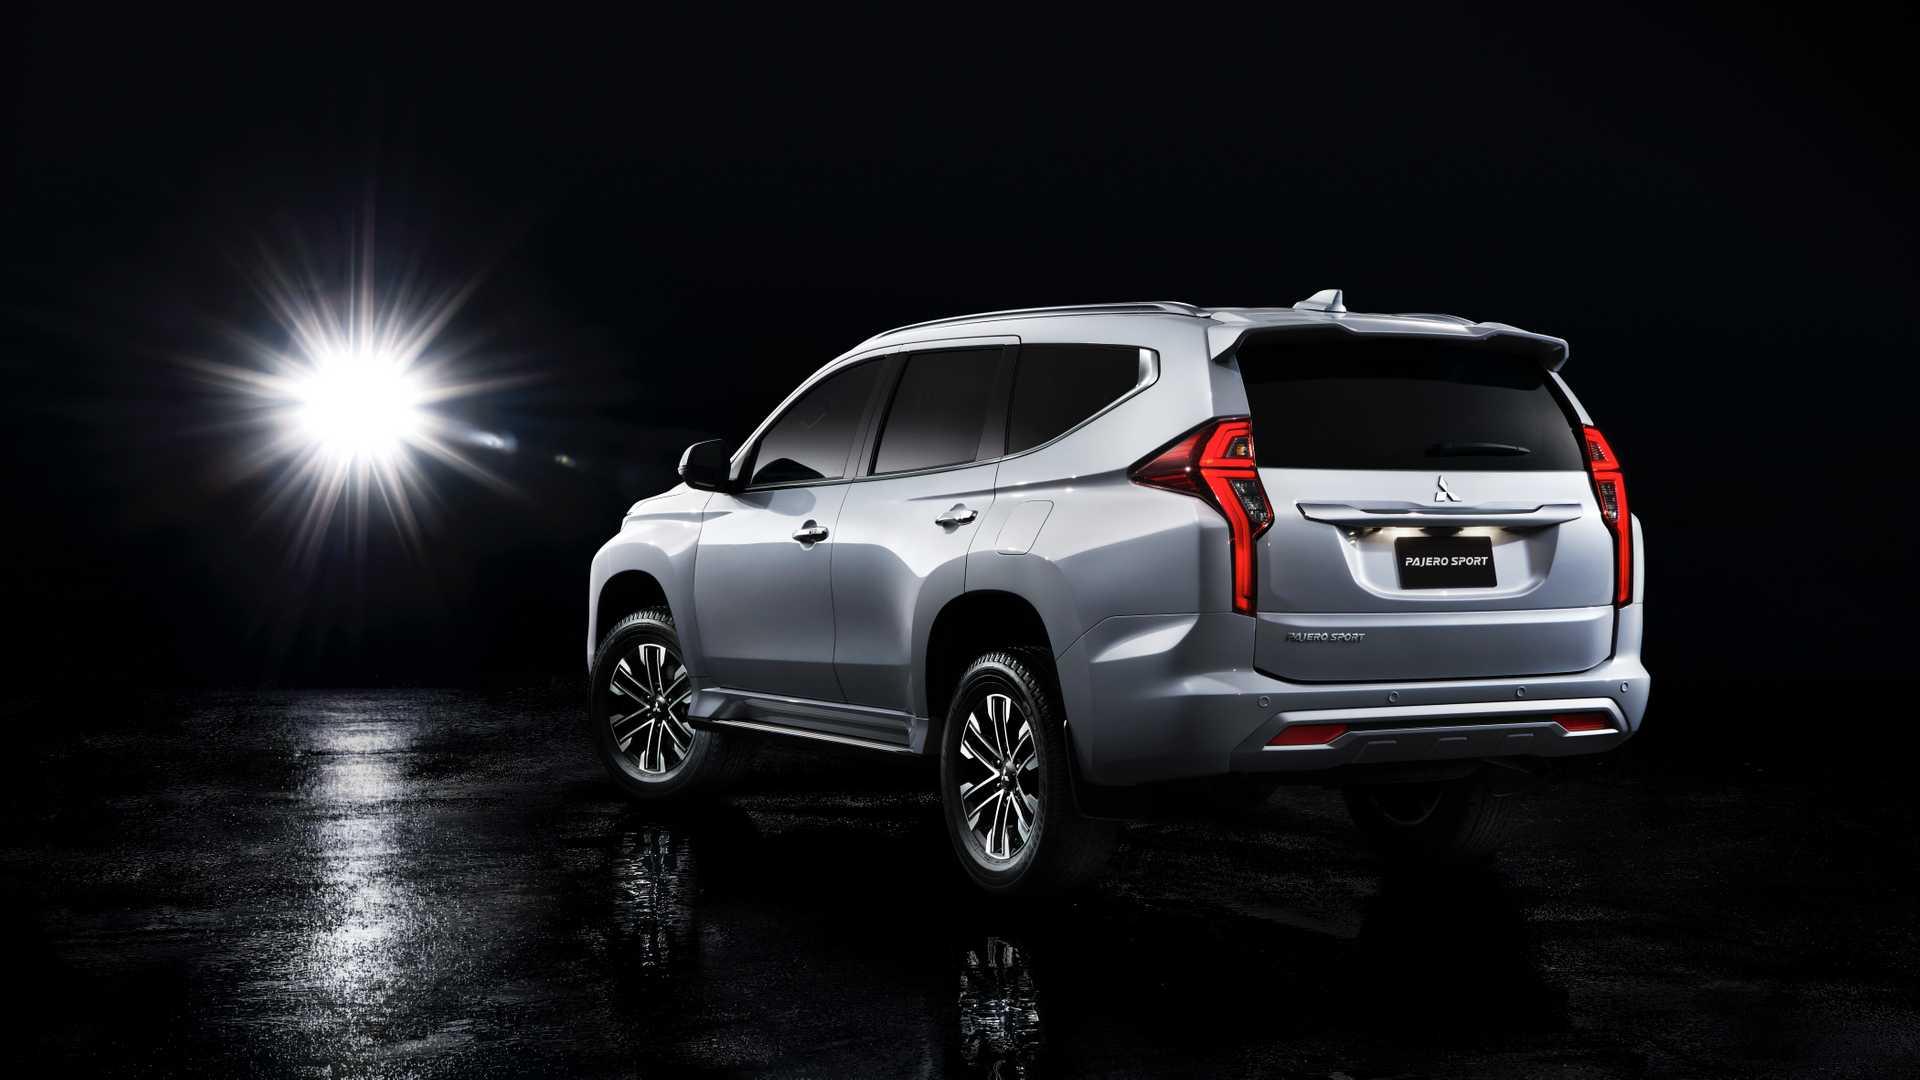 2020_Mitsubishi_Pajero_Sport_facelift_0020